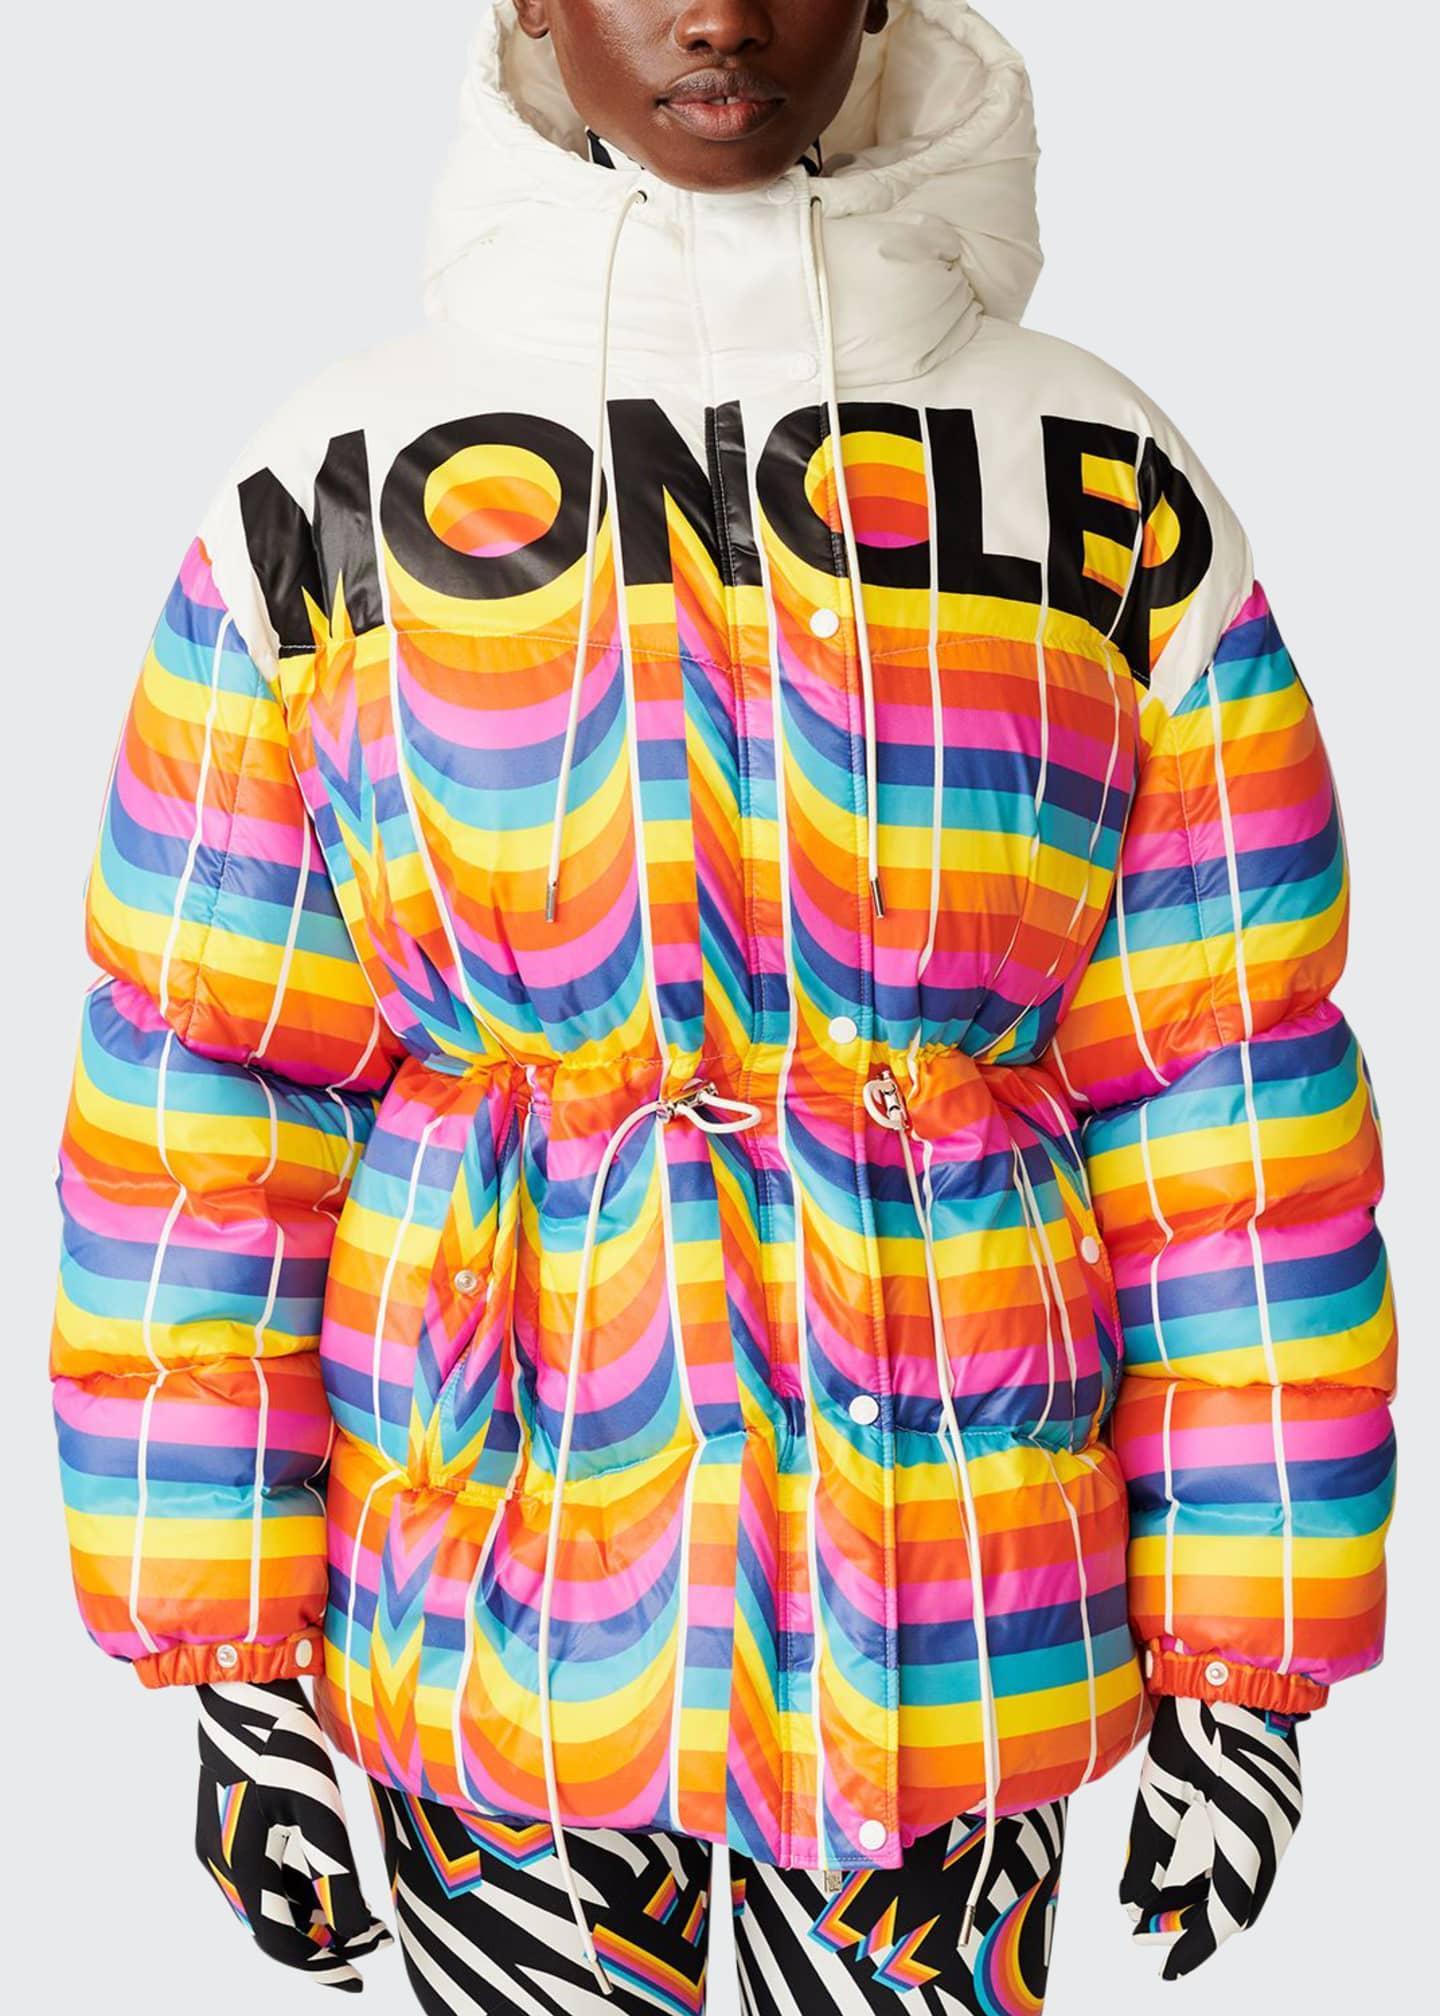 Moncler Genius Richard Quinn Hooded Rainbow Jacket